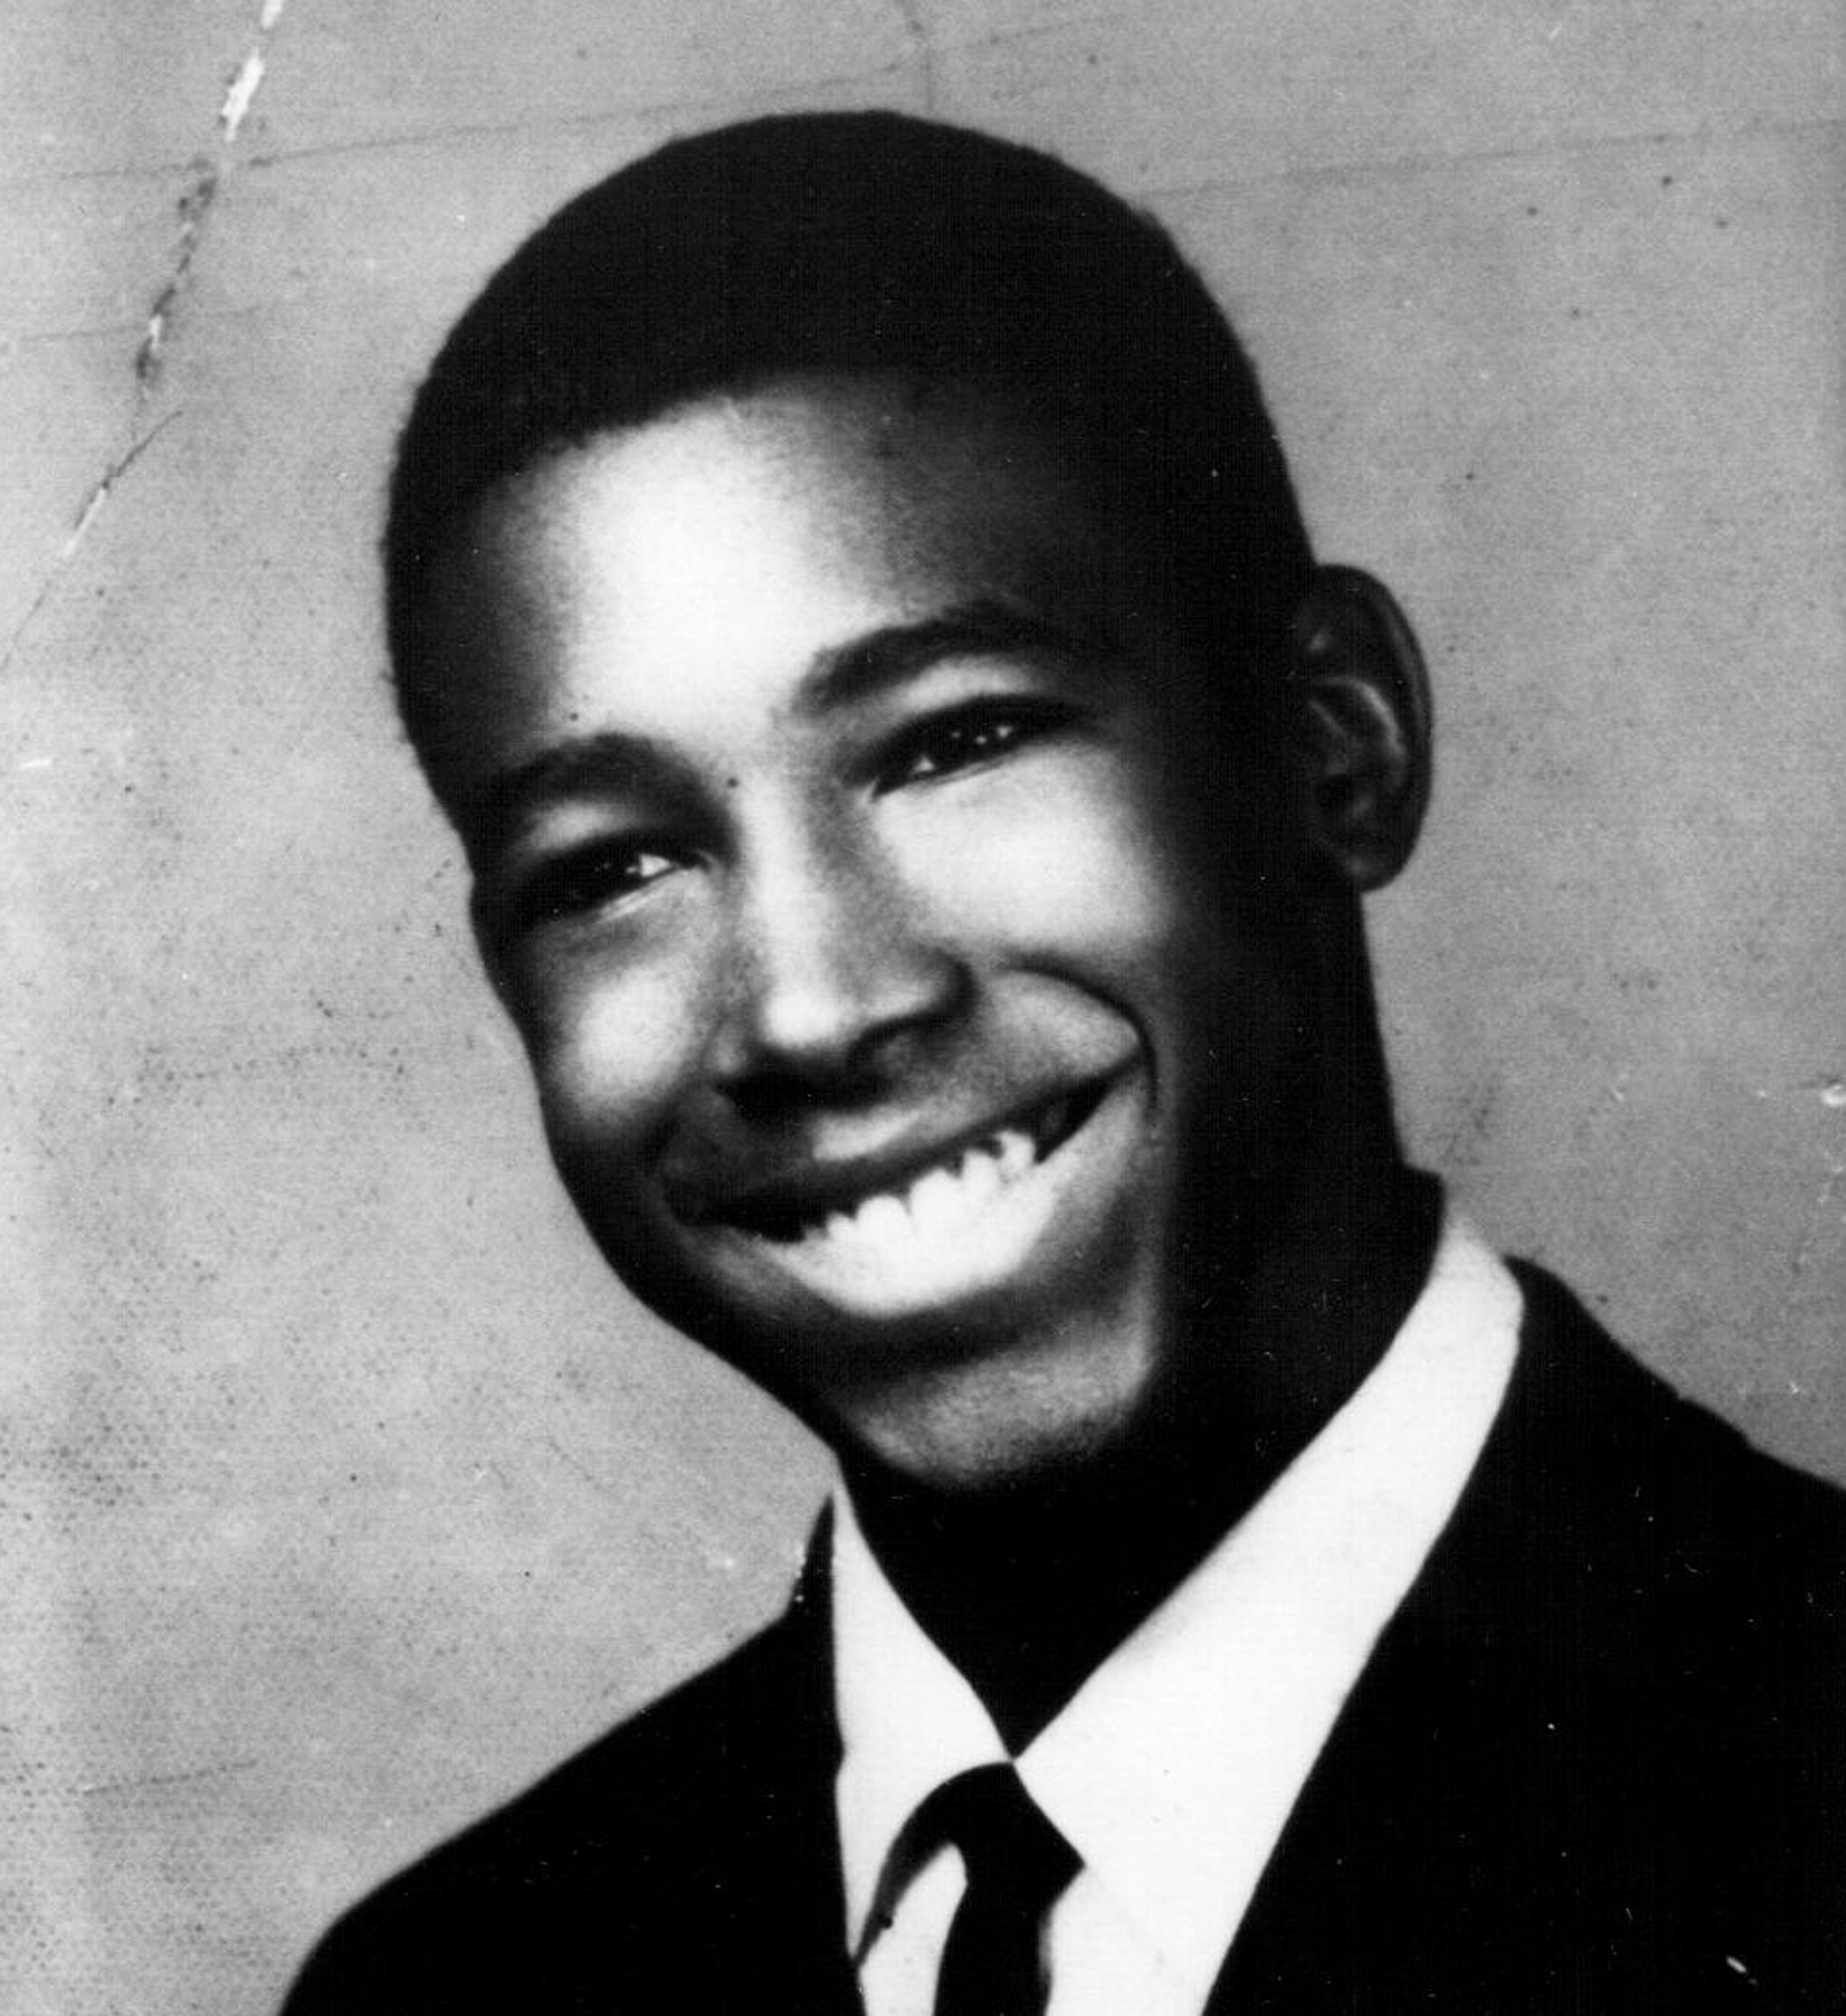 Ben Carson's graduation from Southwestern High School, Detroit circa 1969.